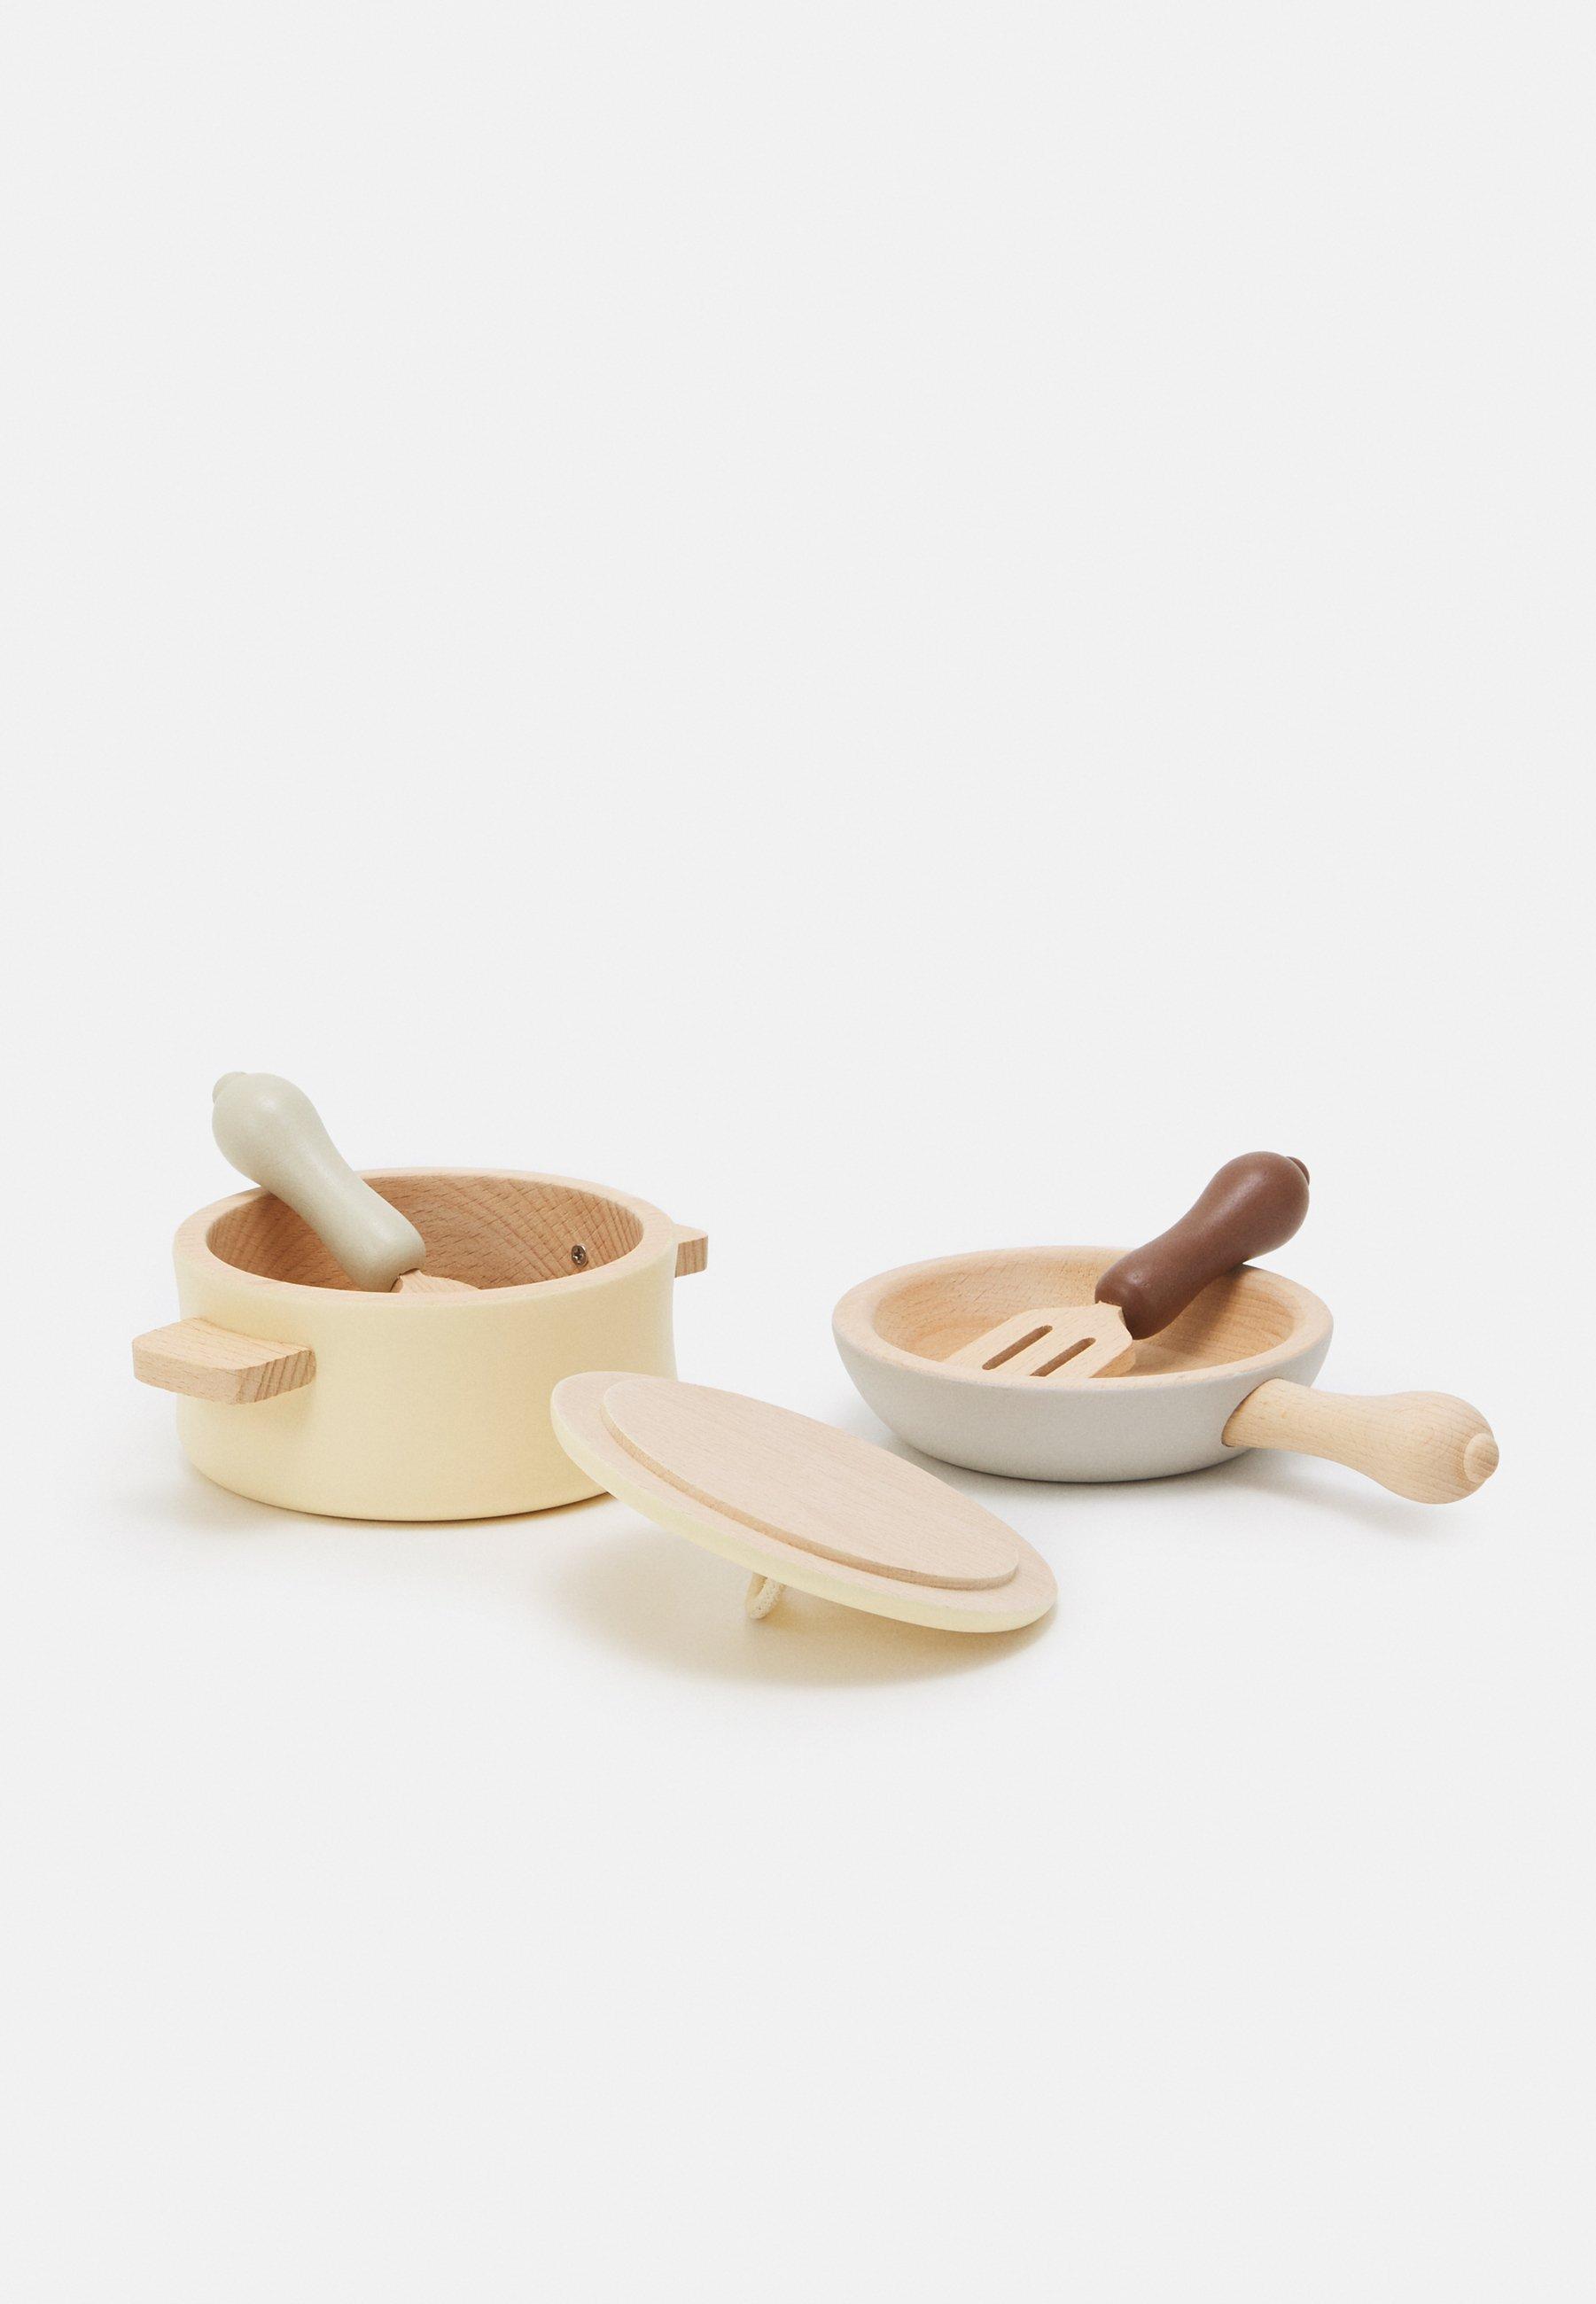 Kinder POTS AND PANS UNISEX - Spielzeug